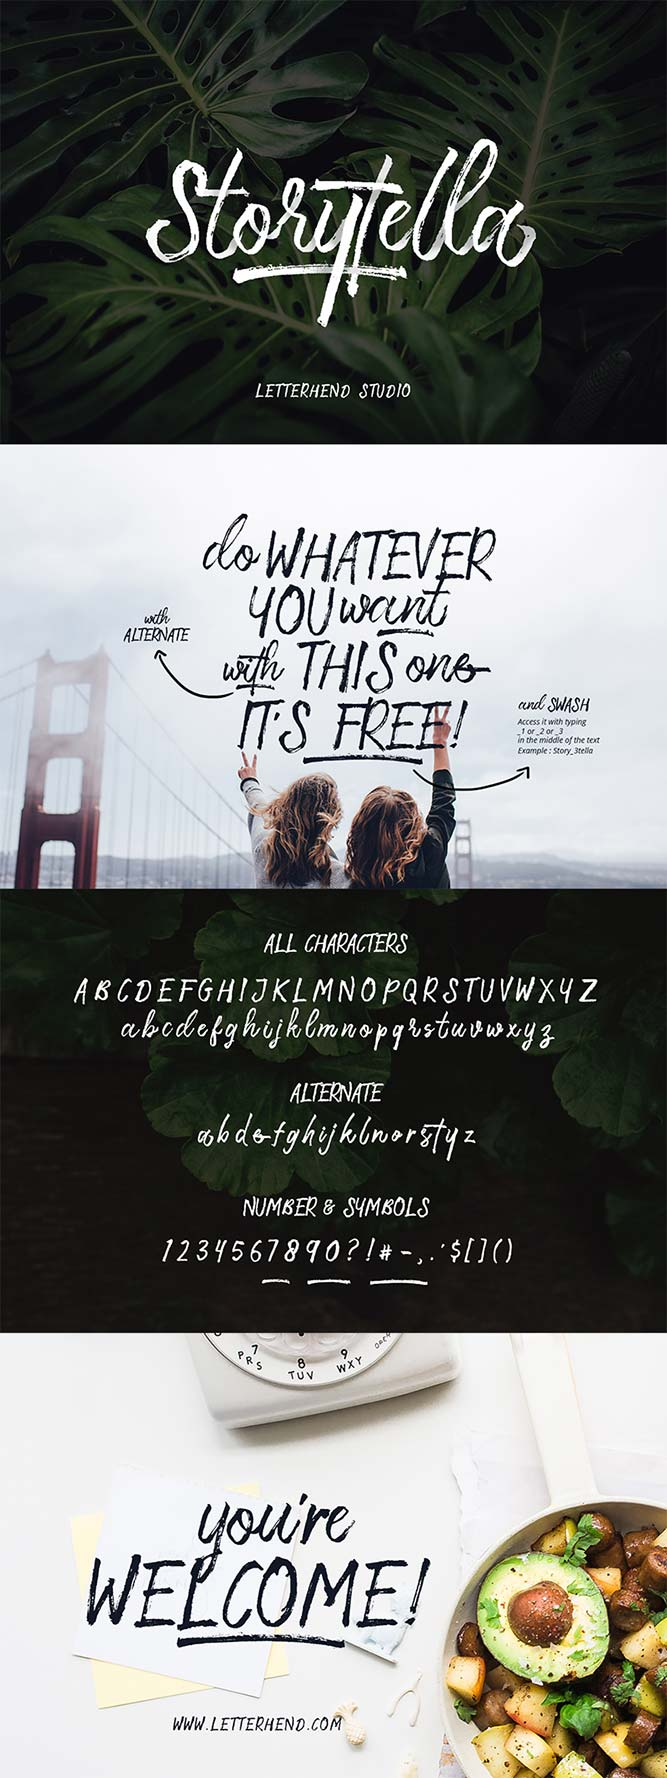 storytella free font download